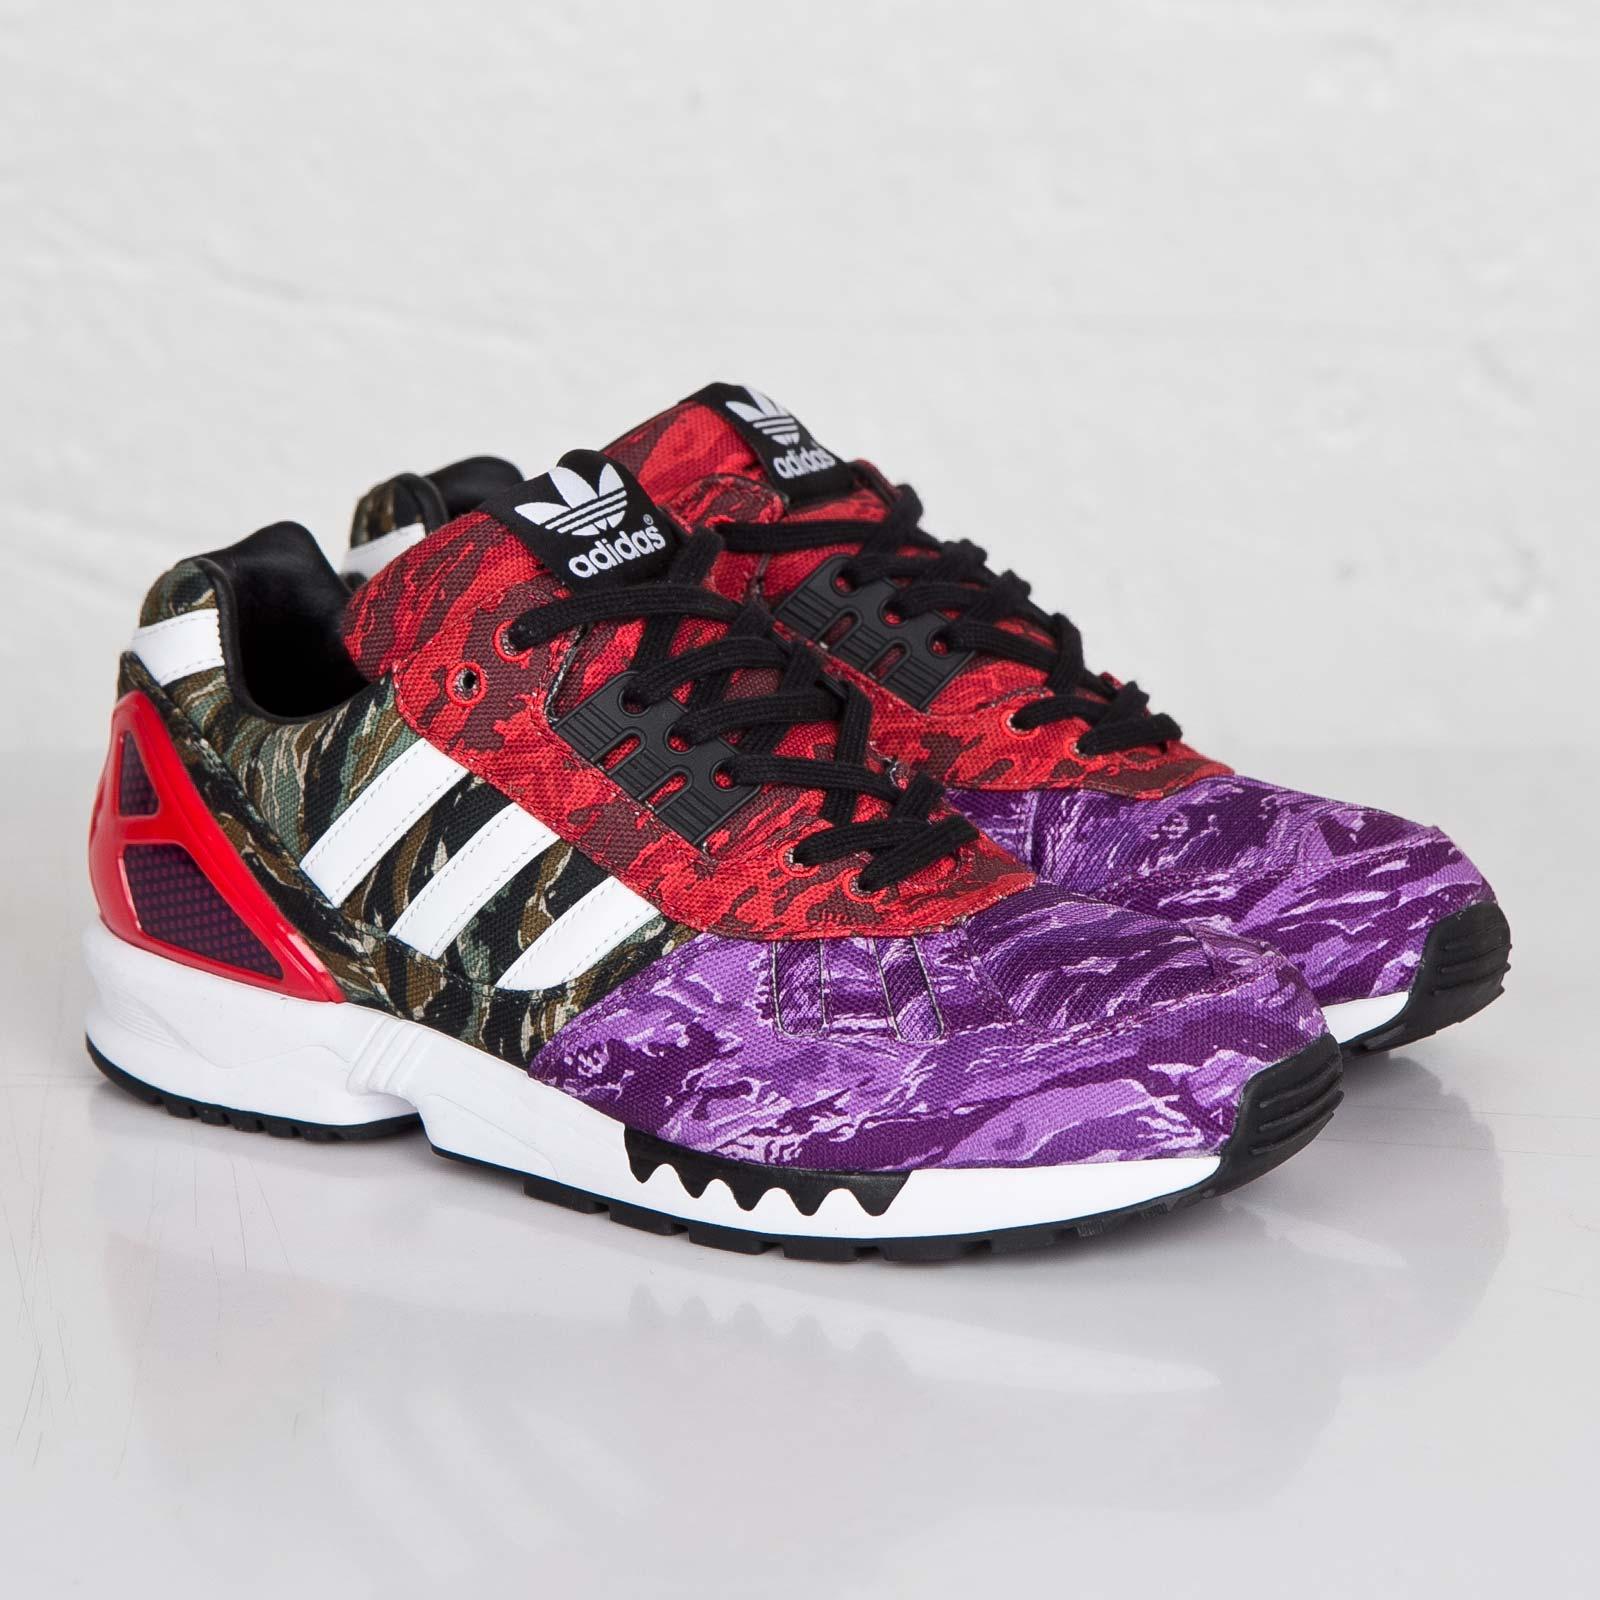 33aa4c270ee65 adidas ZX 7000 - Blvck Scale - B34943 - Sneakersnstuff